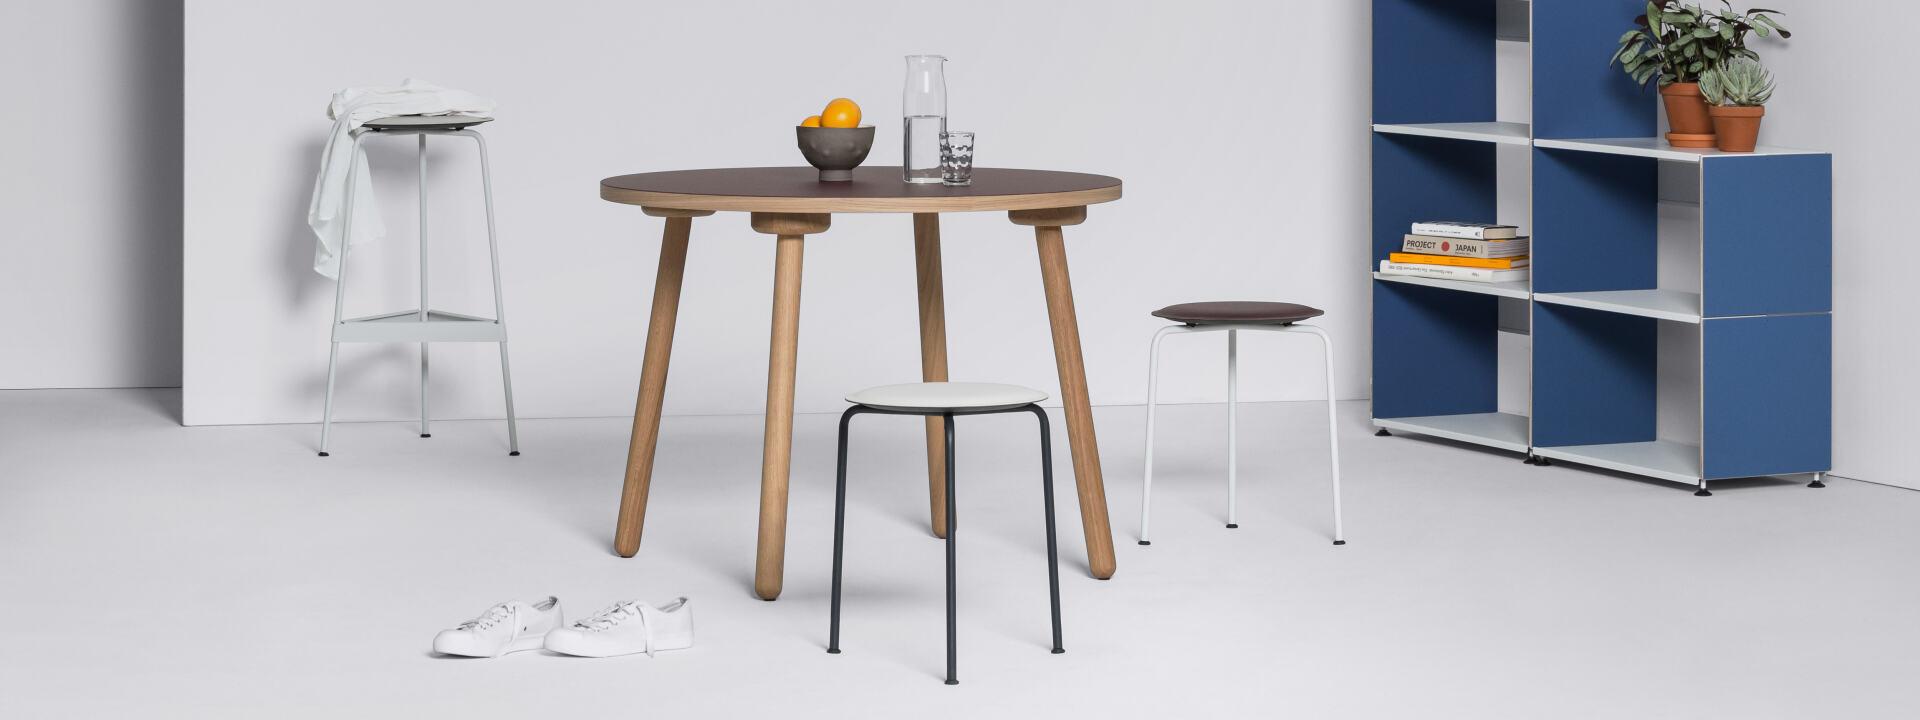 Ravioli Linoleum Hocker S, Stühle & Hocker